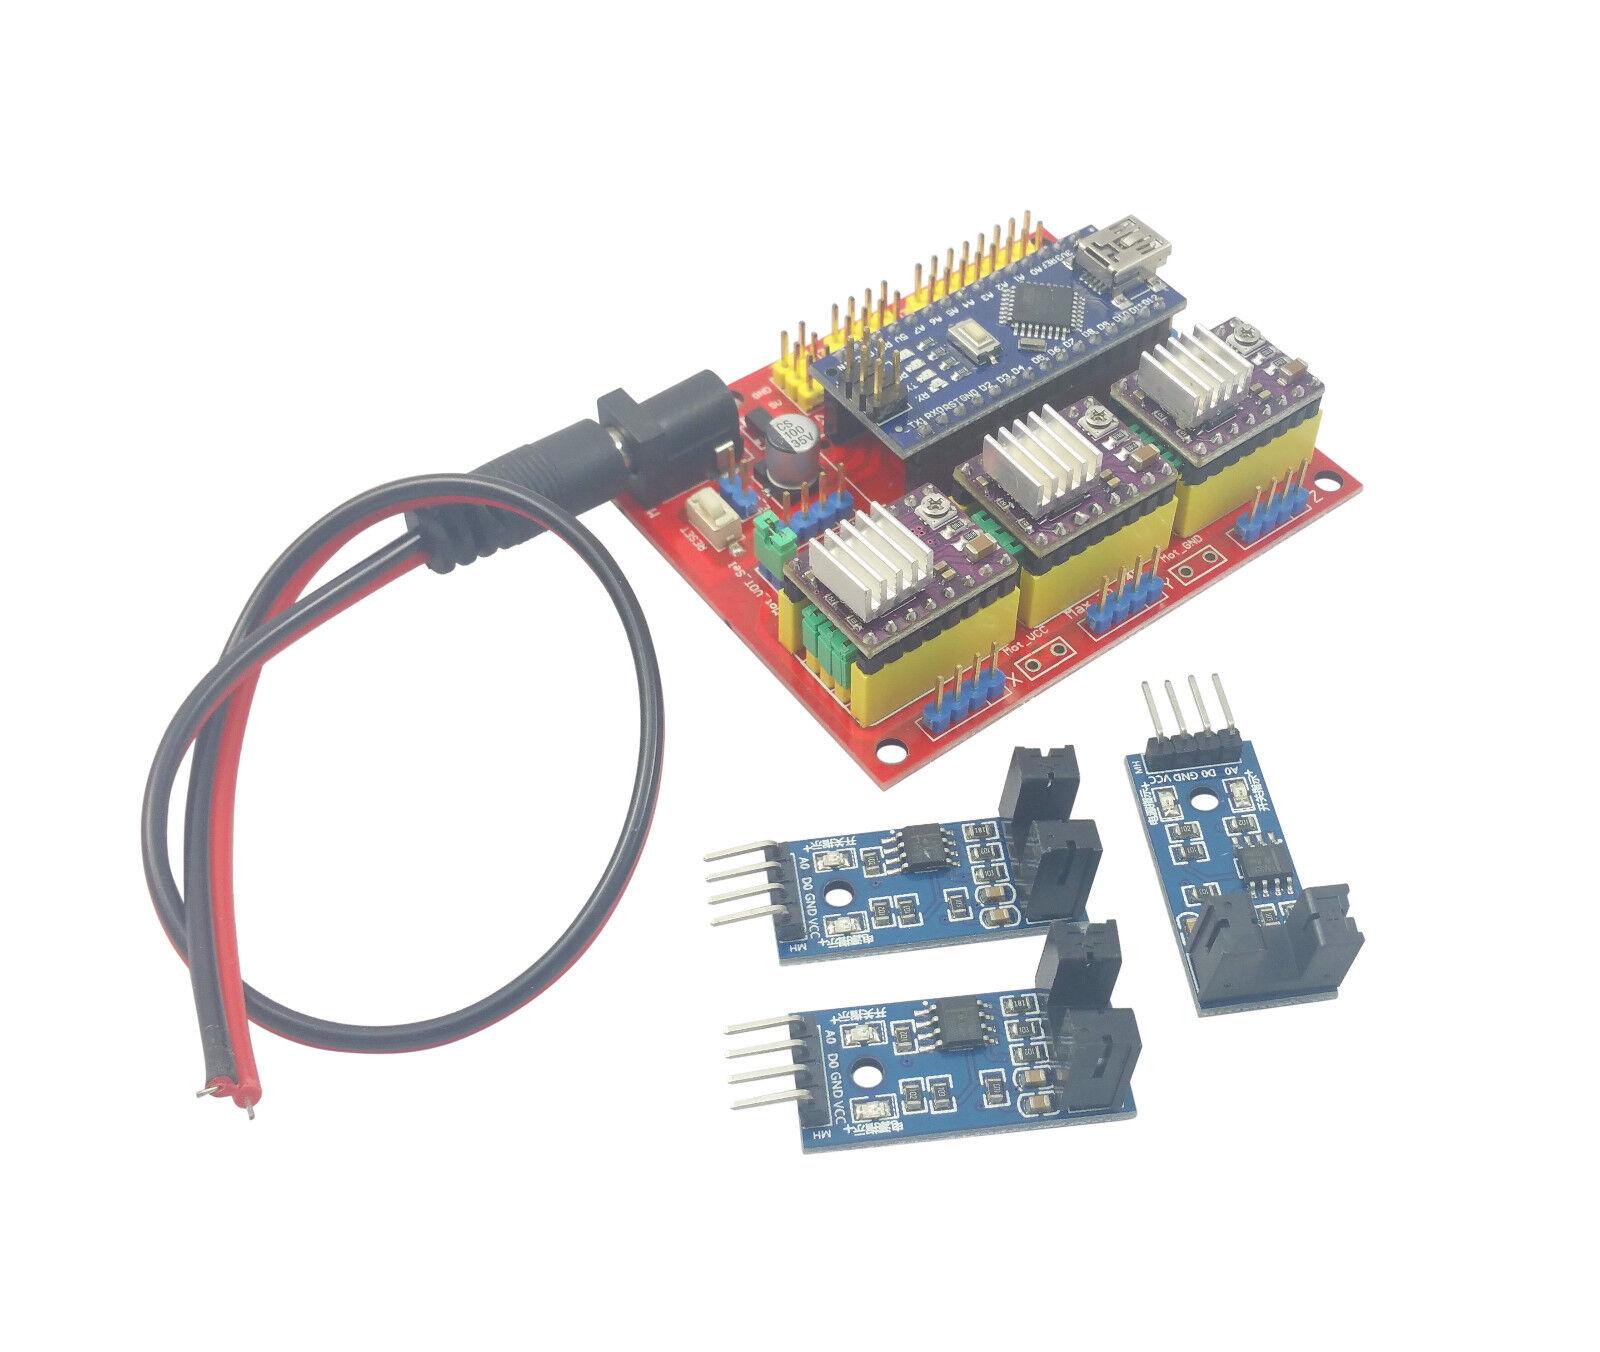 hight resolution of arduino nano cnc shield drv8825 board package kit w 3x optical cnc machine control diagram cnc cnc limit switch